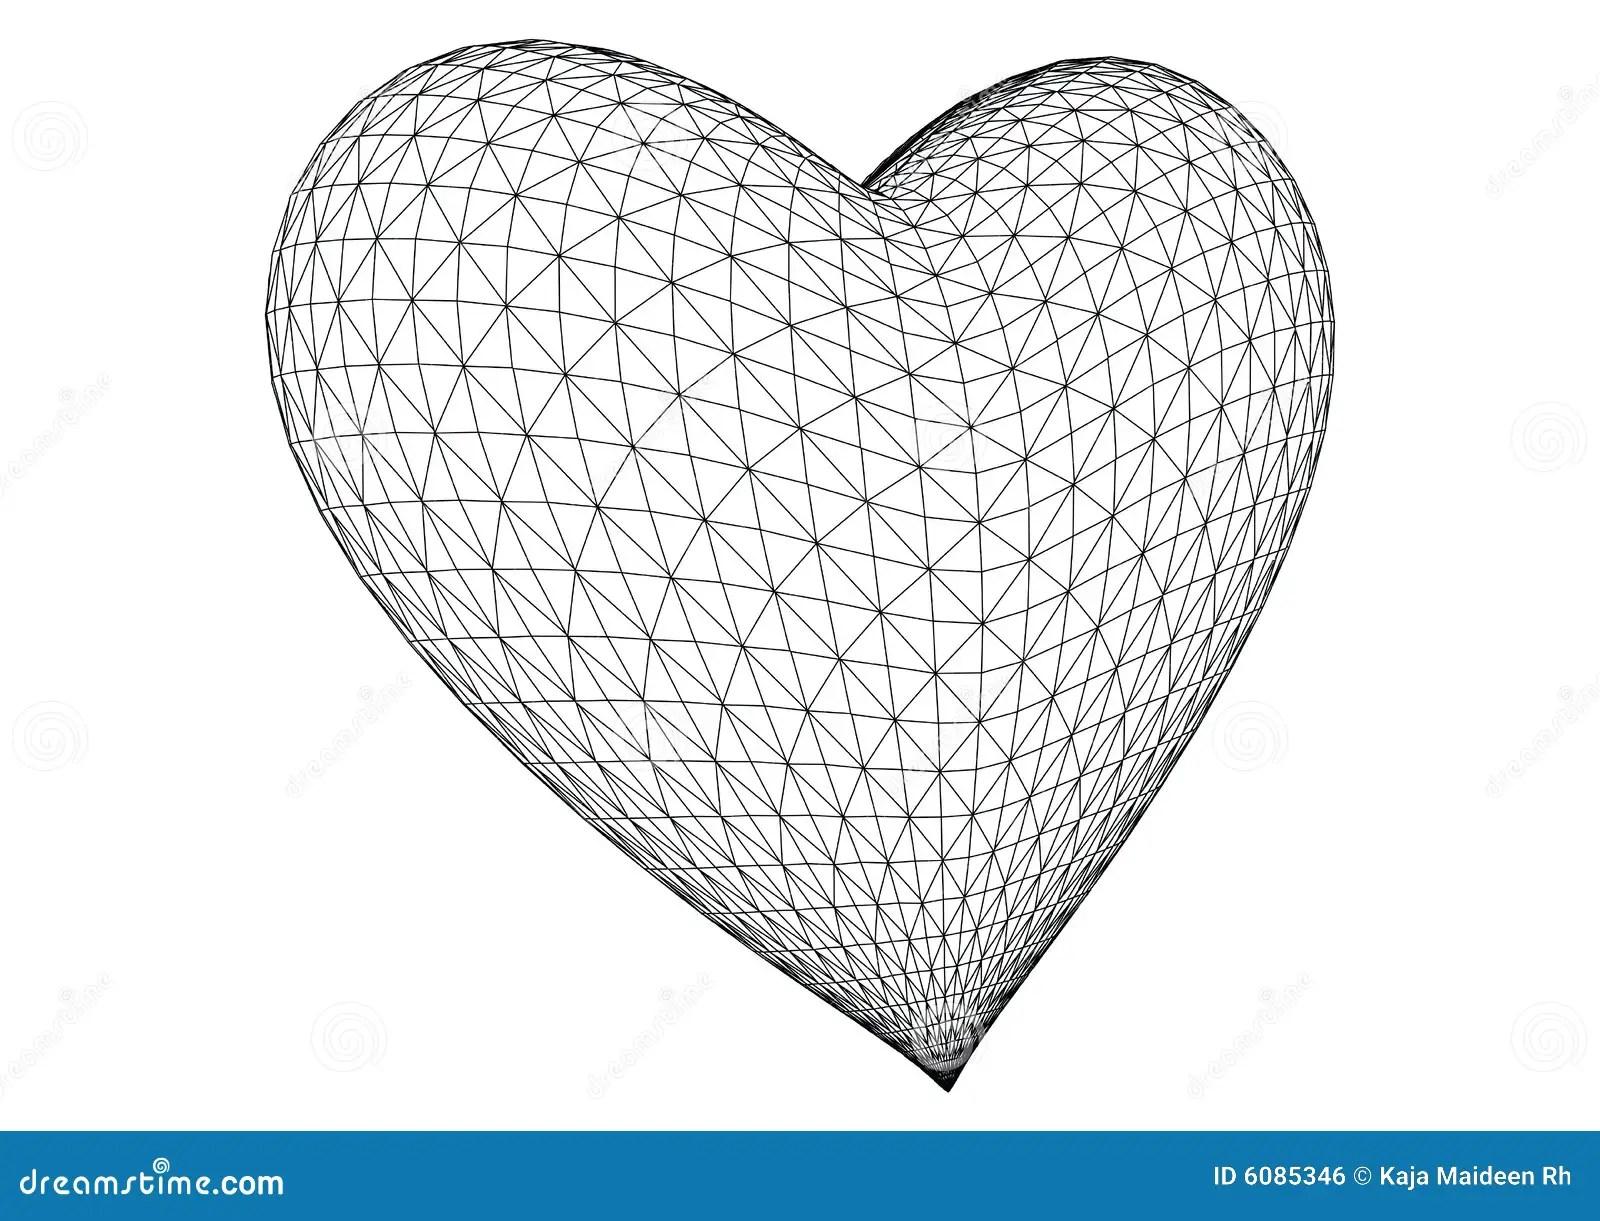 3d Rendered Heart Vector Stock Vector Illustration Of